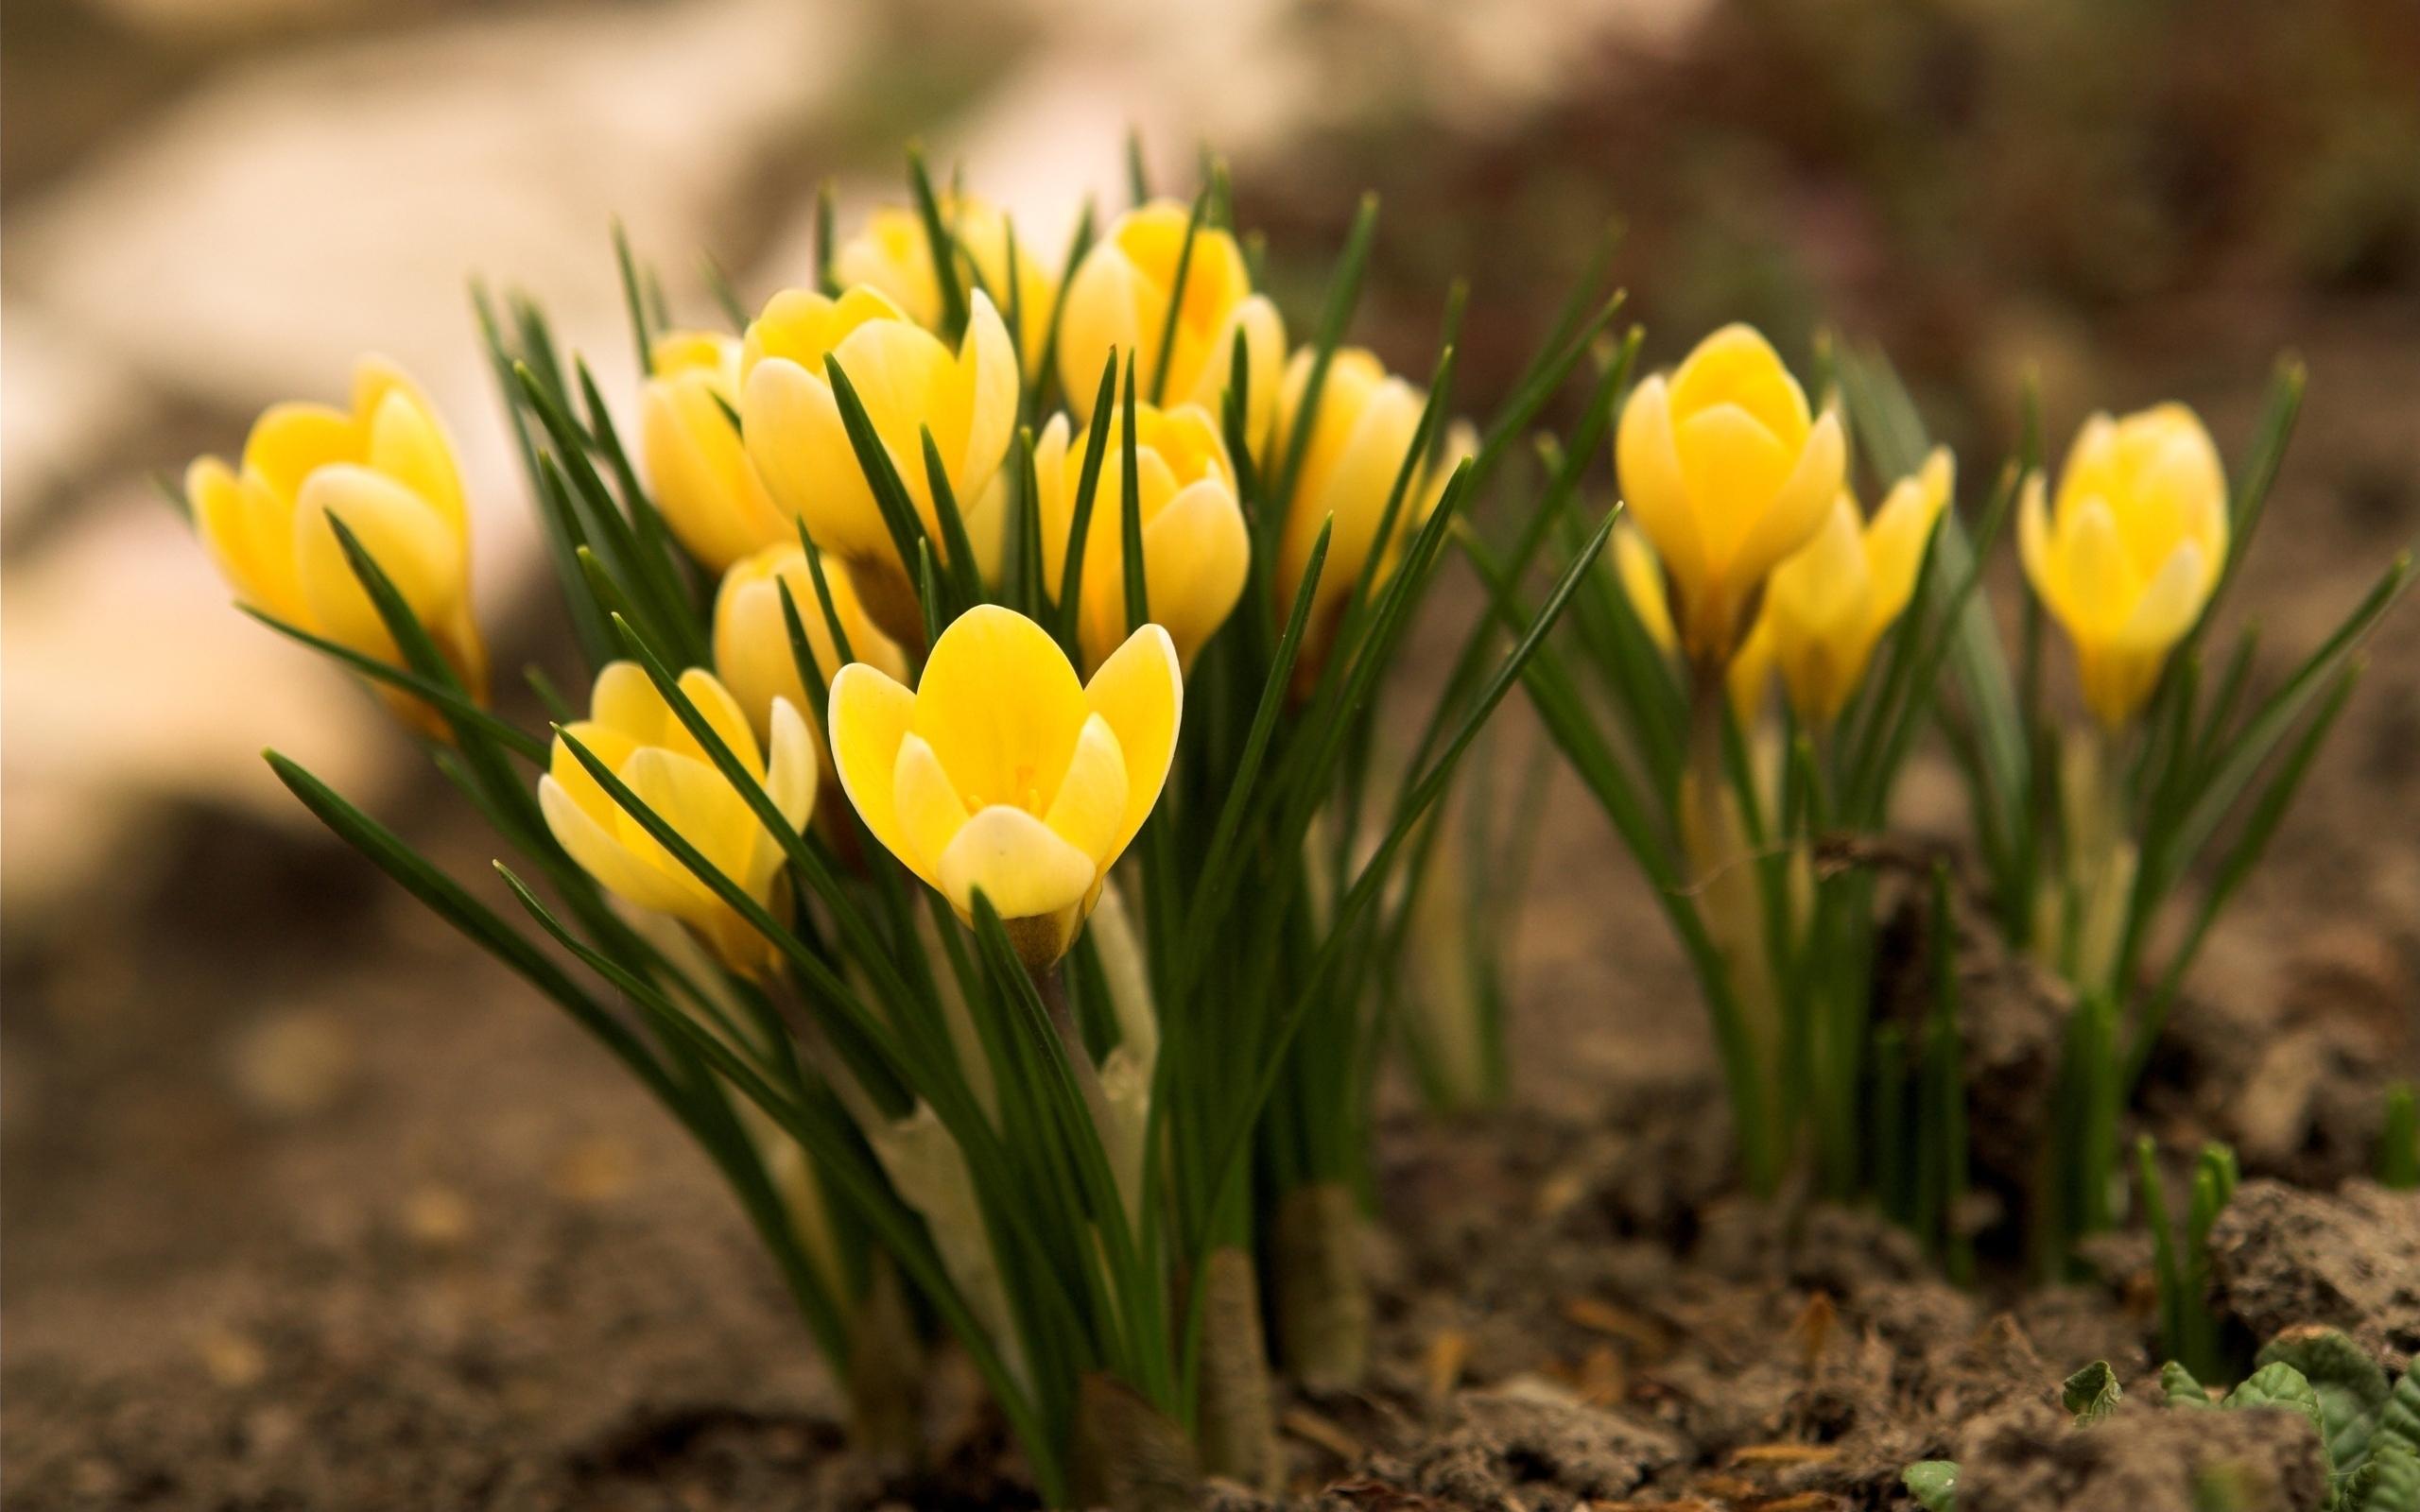 Yellow Crocus Flowers Photo